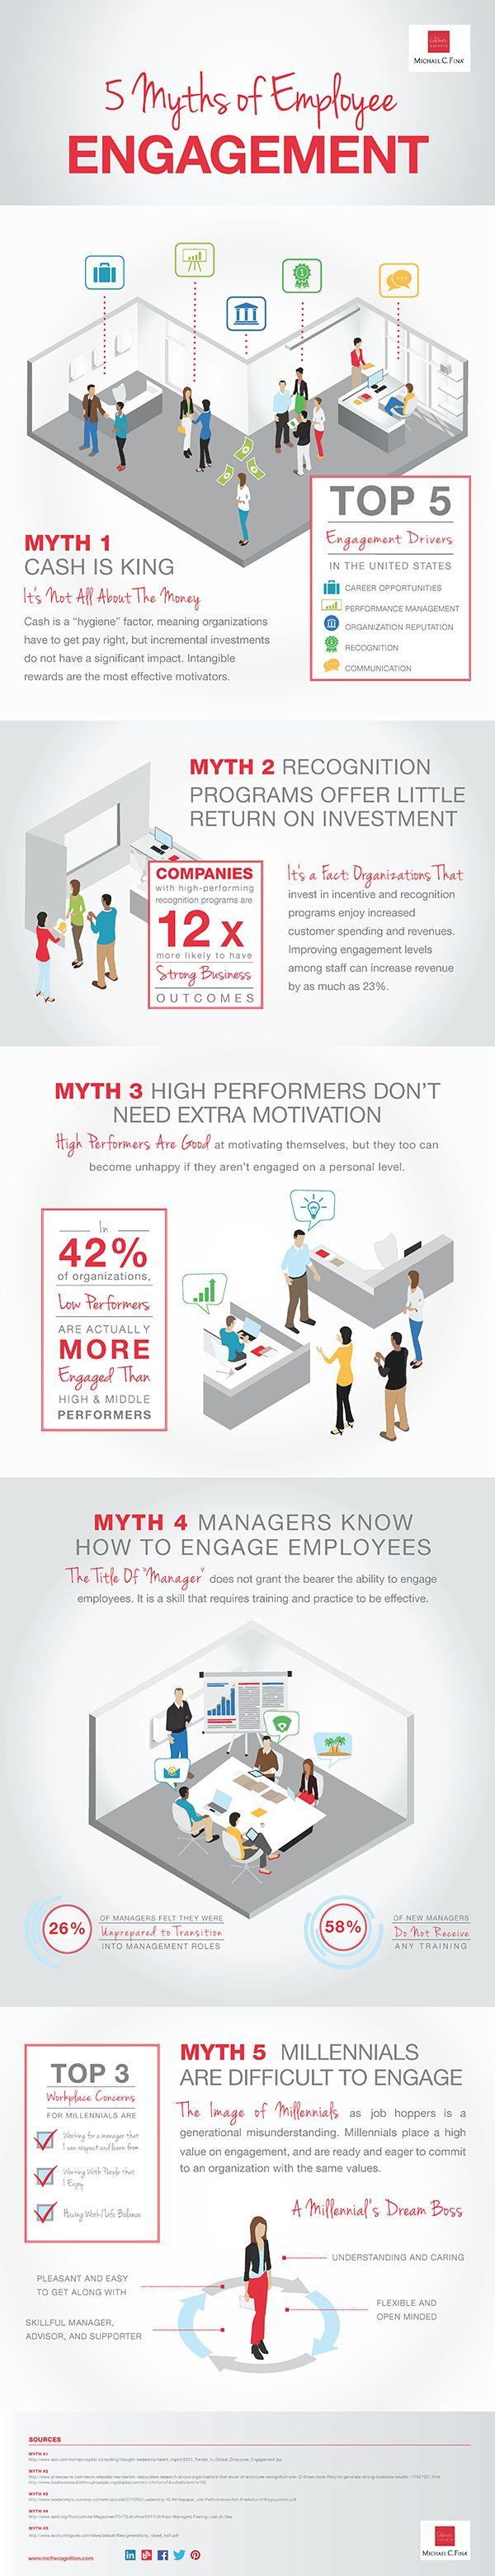 Five Myths of Employee Engagement by @mcfrecognition | via @Elizabeth Lupfer